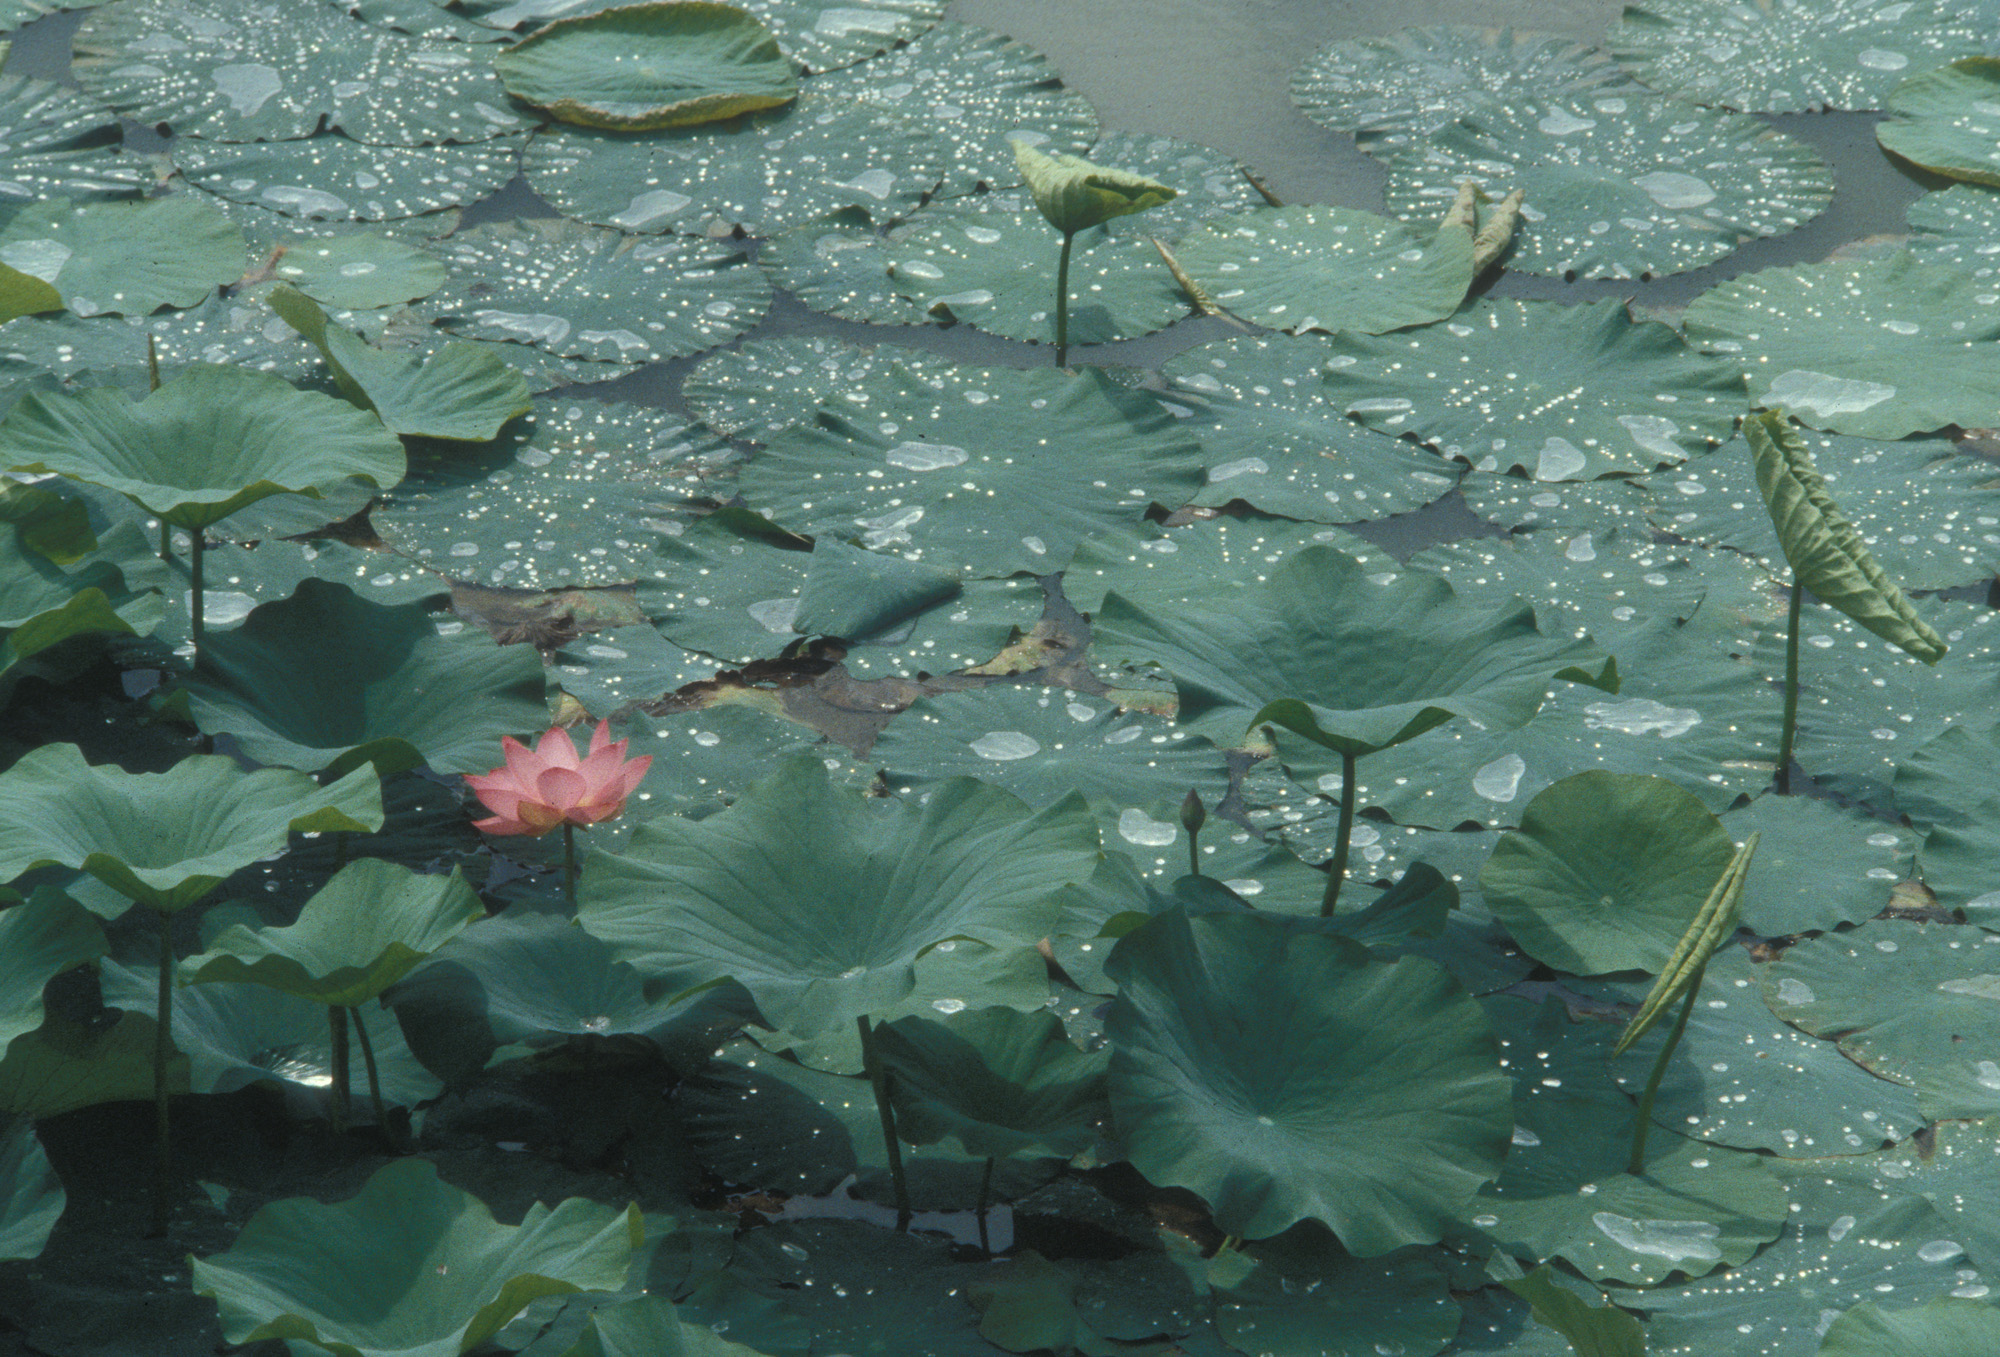 Blüte, Blüten, Pflanze, Pflanzen, Natur, Wachstum, Leben, Stempel, Blätter, Makrobereich, Makro, analog, Großformat, analoge Fotografie, Seerose